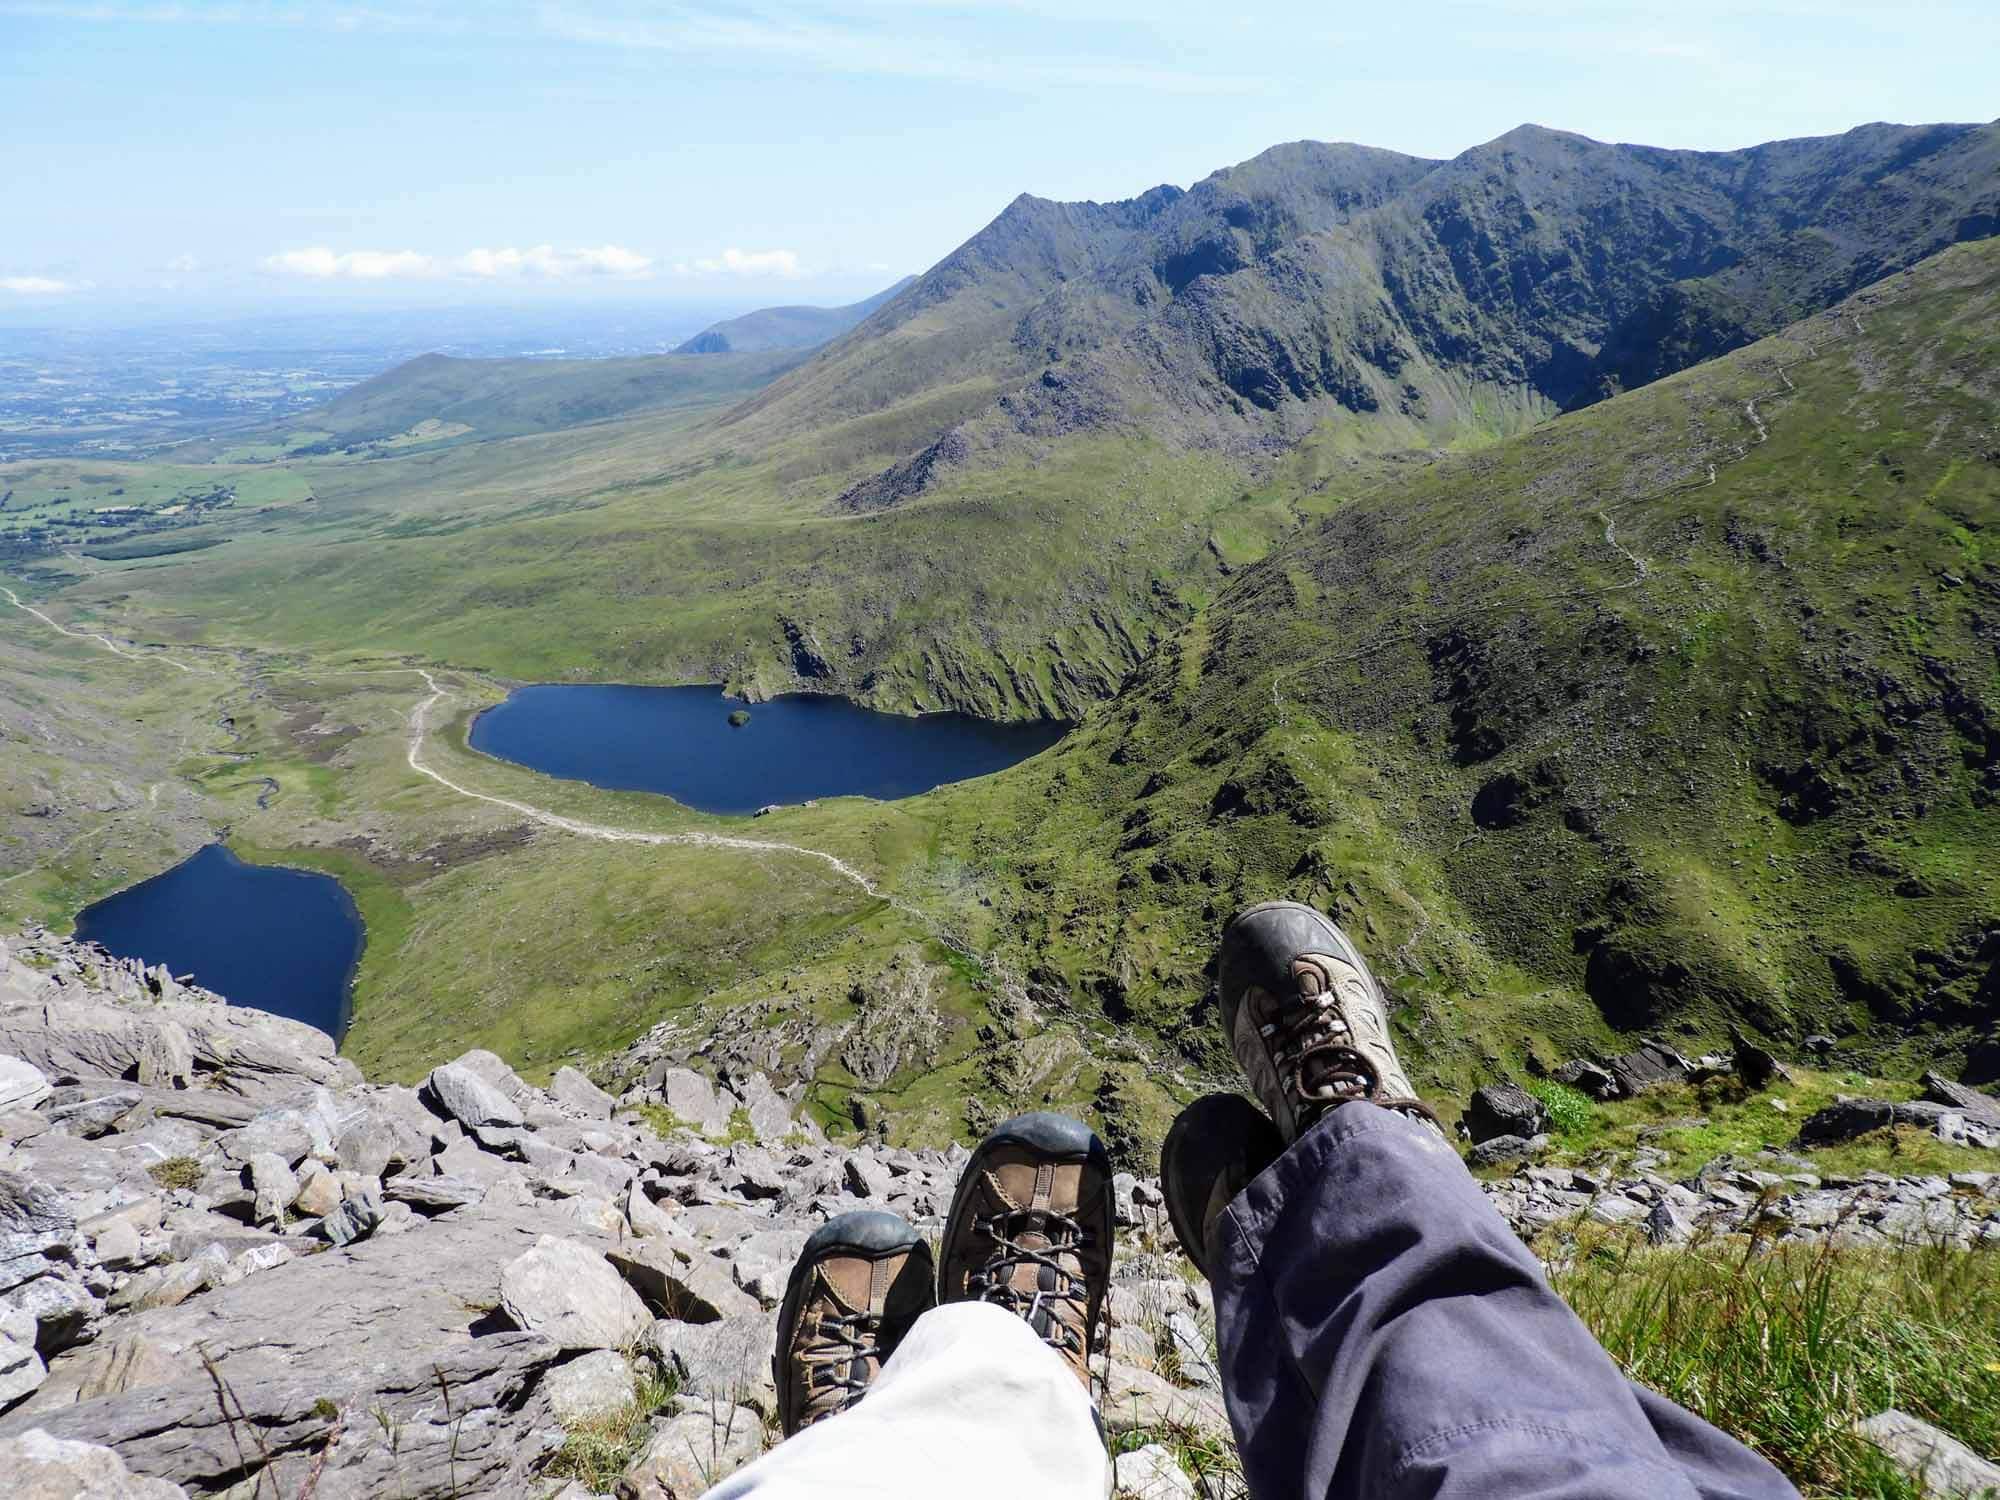 ireland-carrauntoohil-highest-mountain-peak-top-summit-feet.jpg